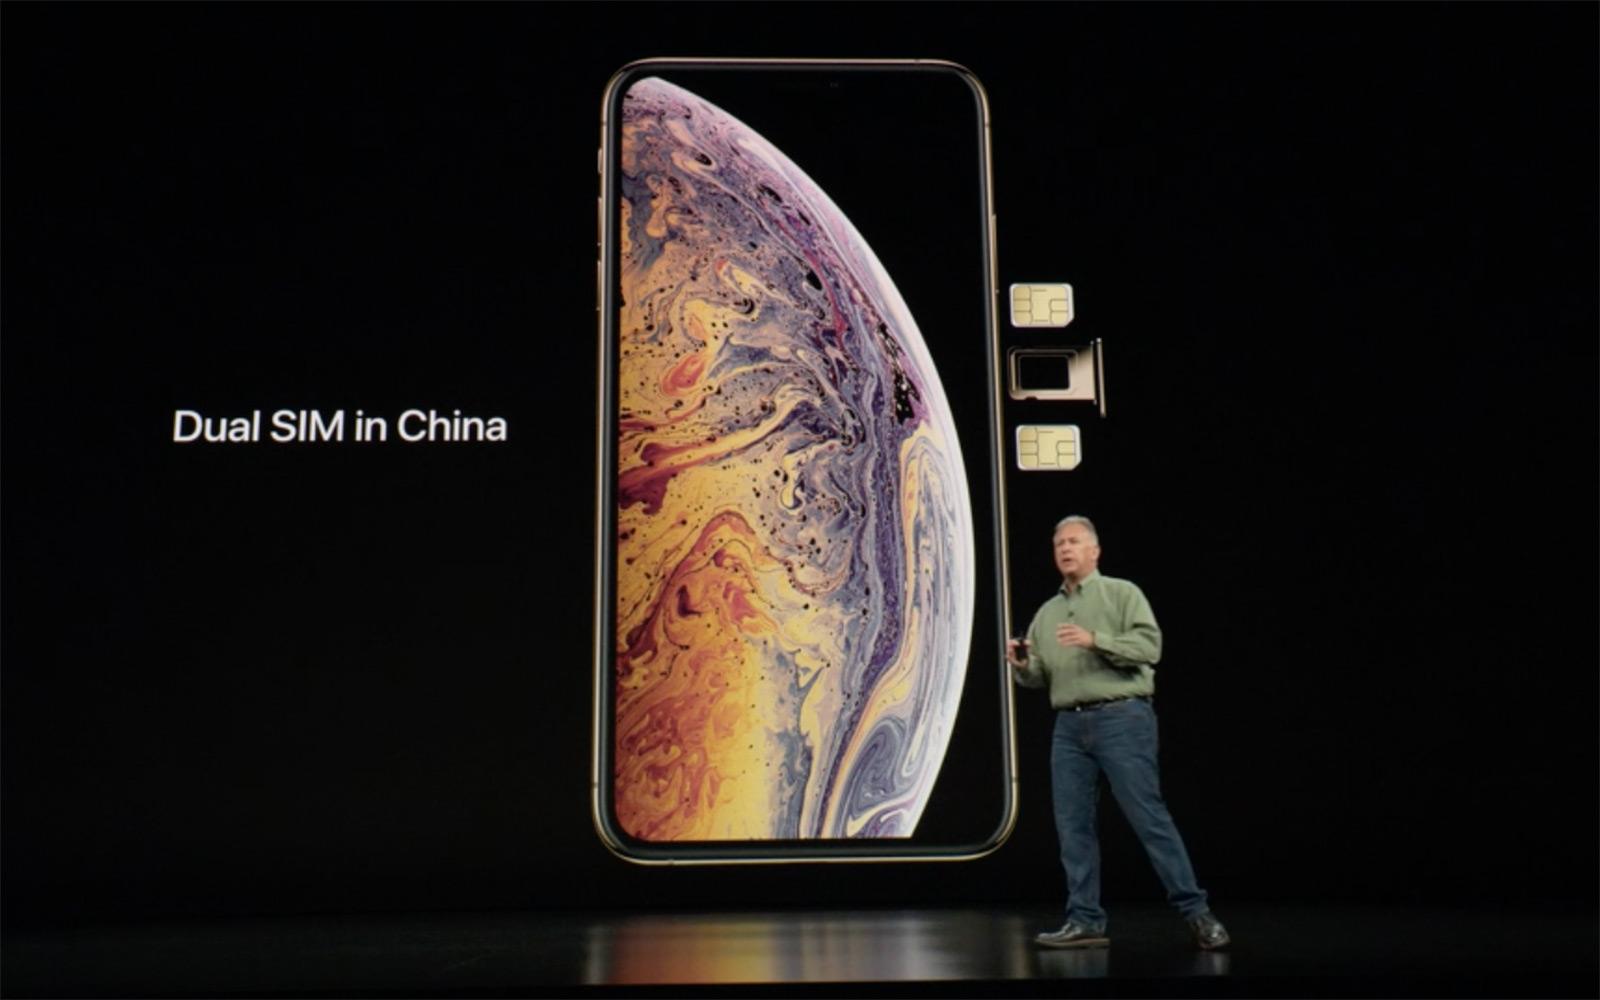 dual-sim-iphone-xs-xs-max